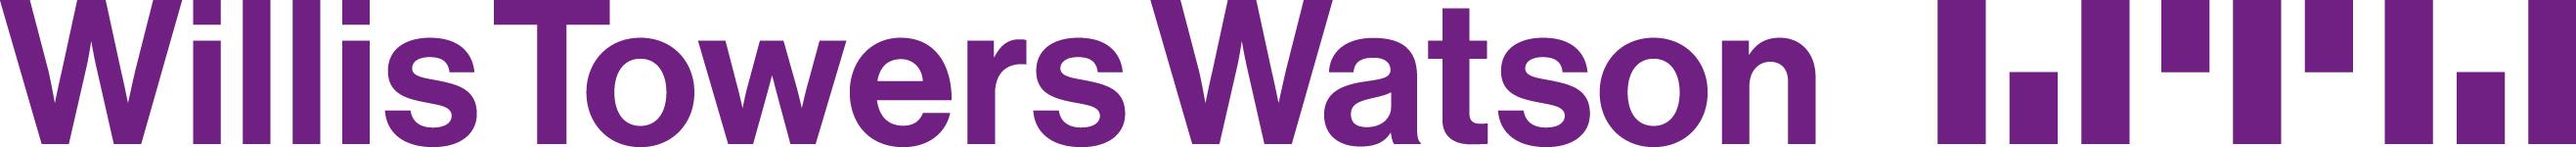 wtw_logo_hrz_rgb WTW Willis Towers Watson